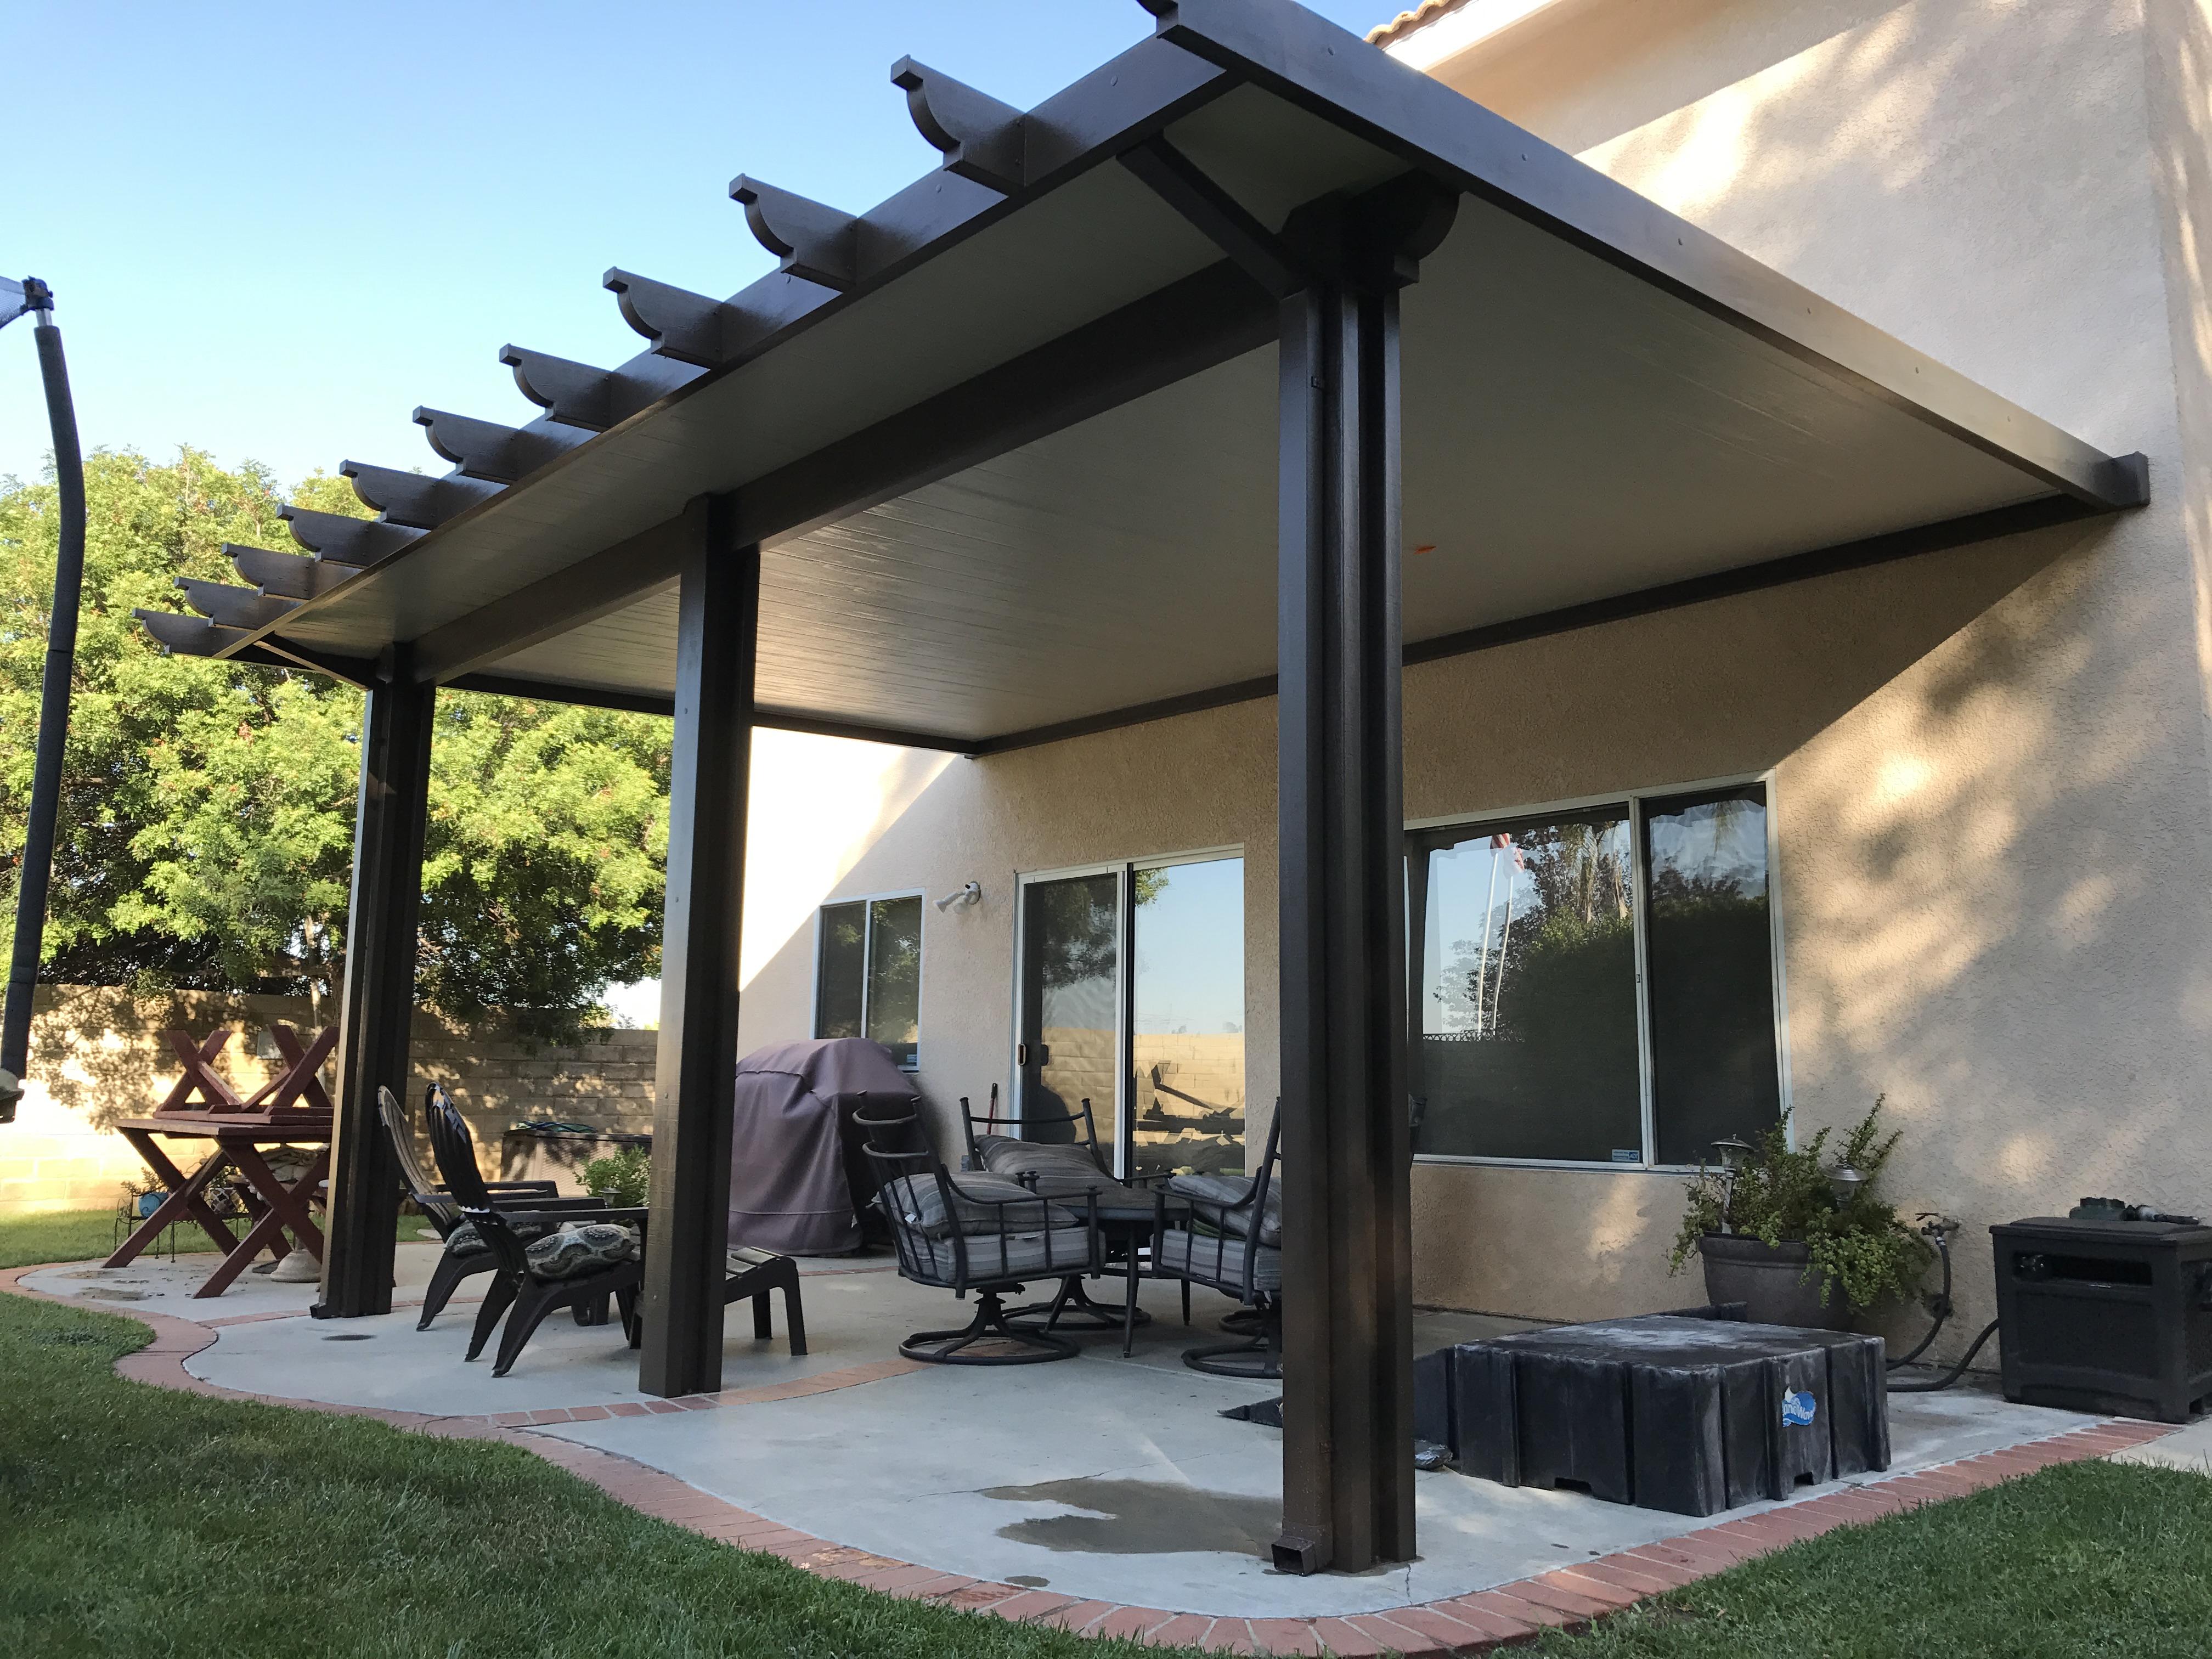 Aluminum Patio Covers Riverside California Alumacovers intended for measurements 4032 X 3024